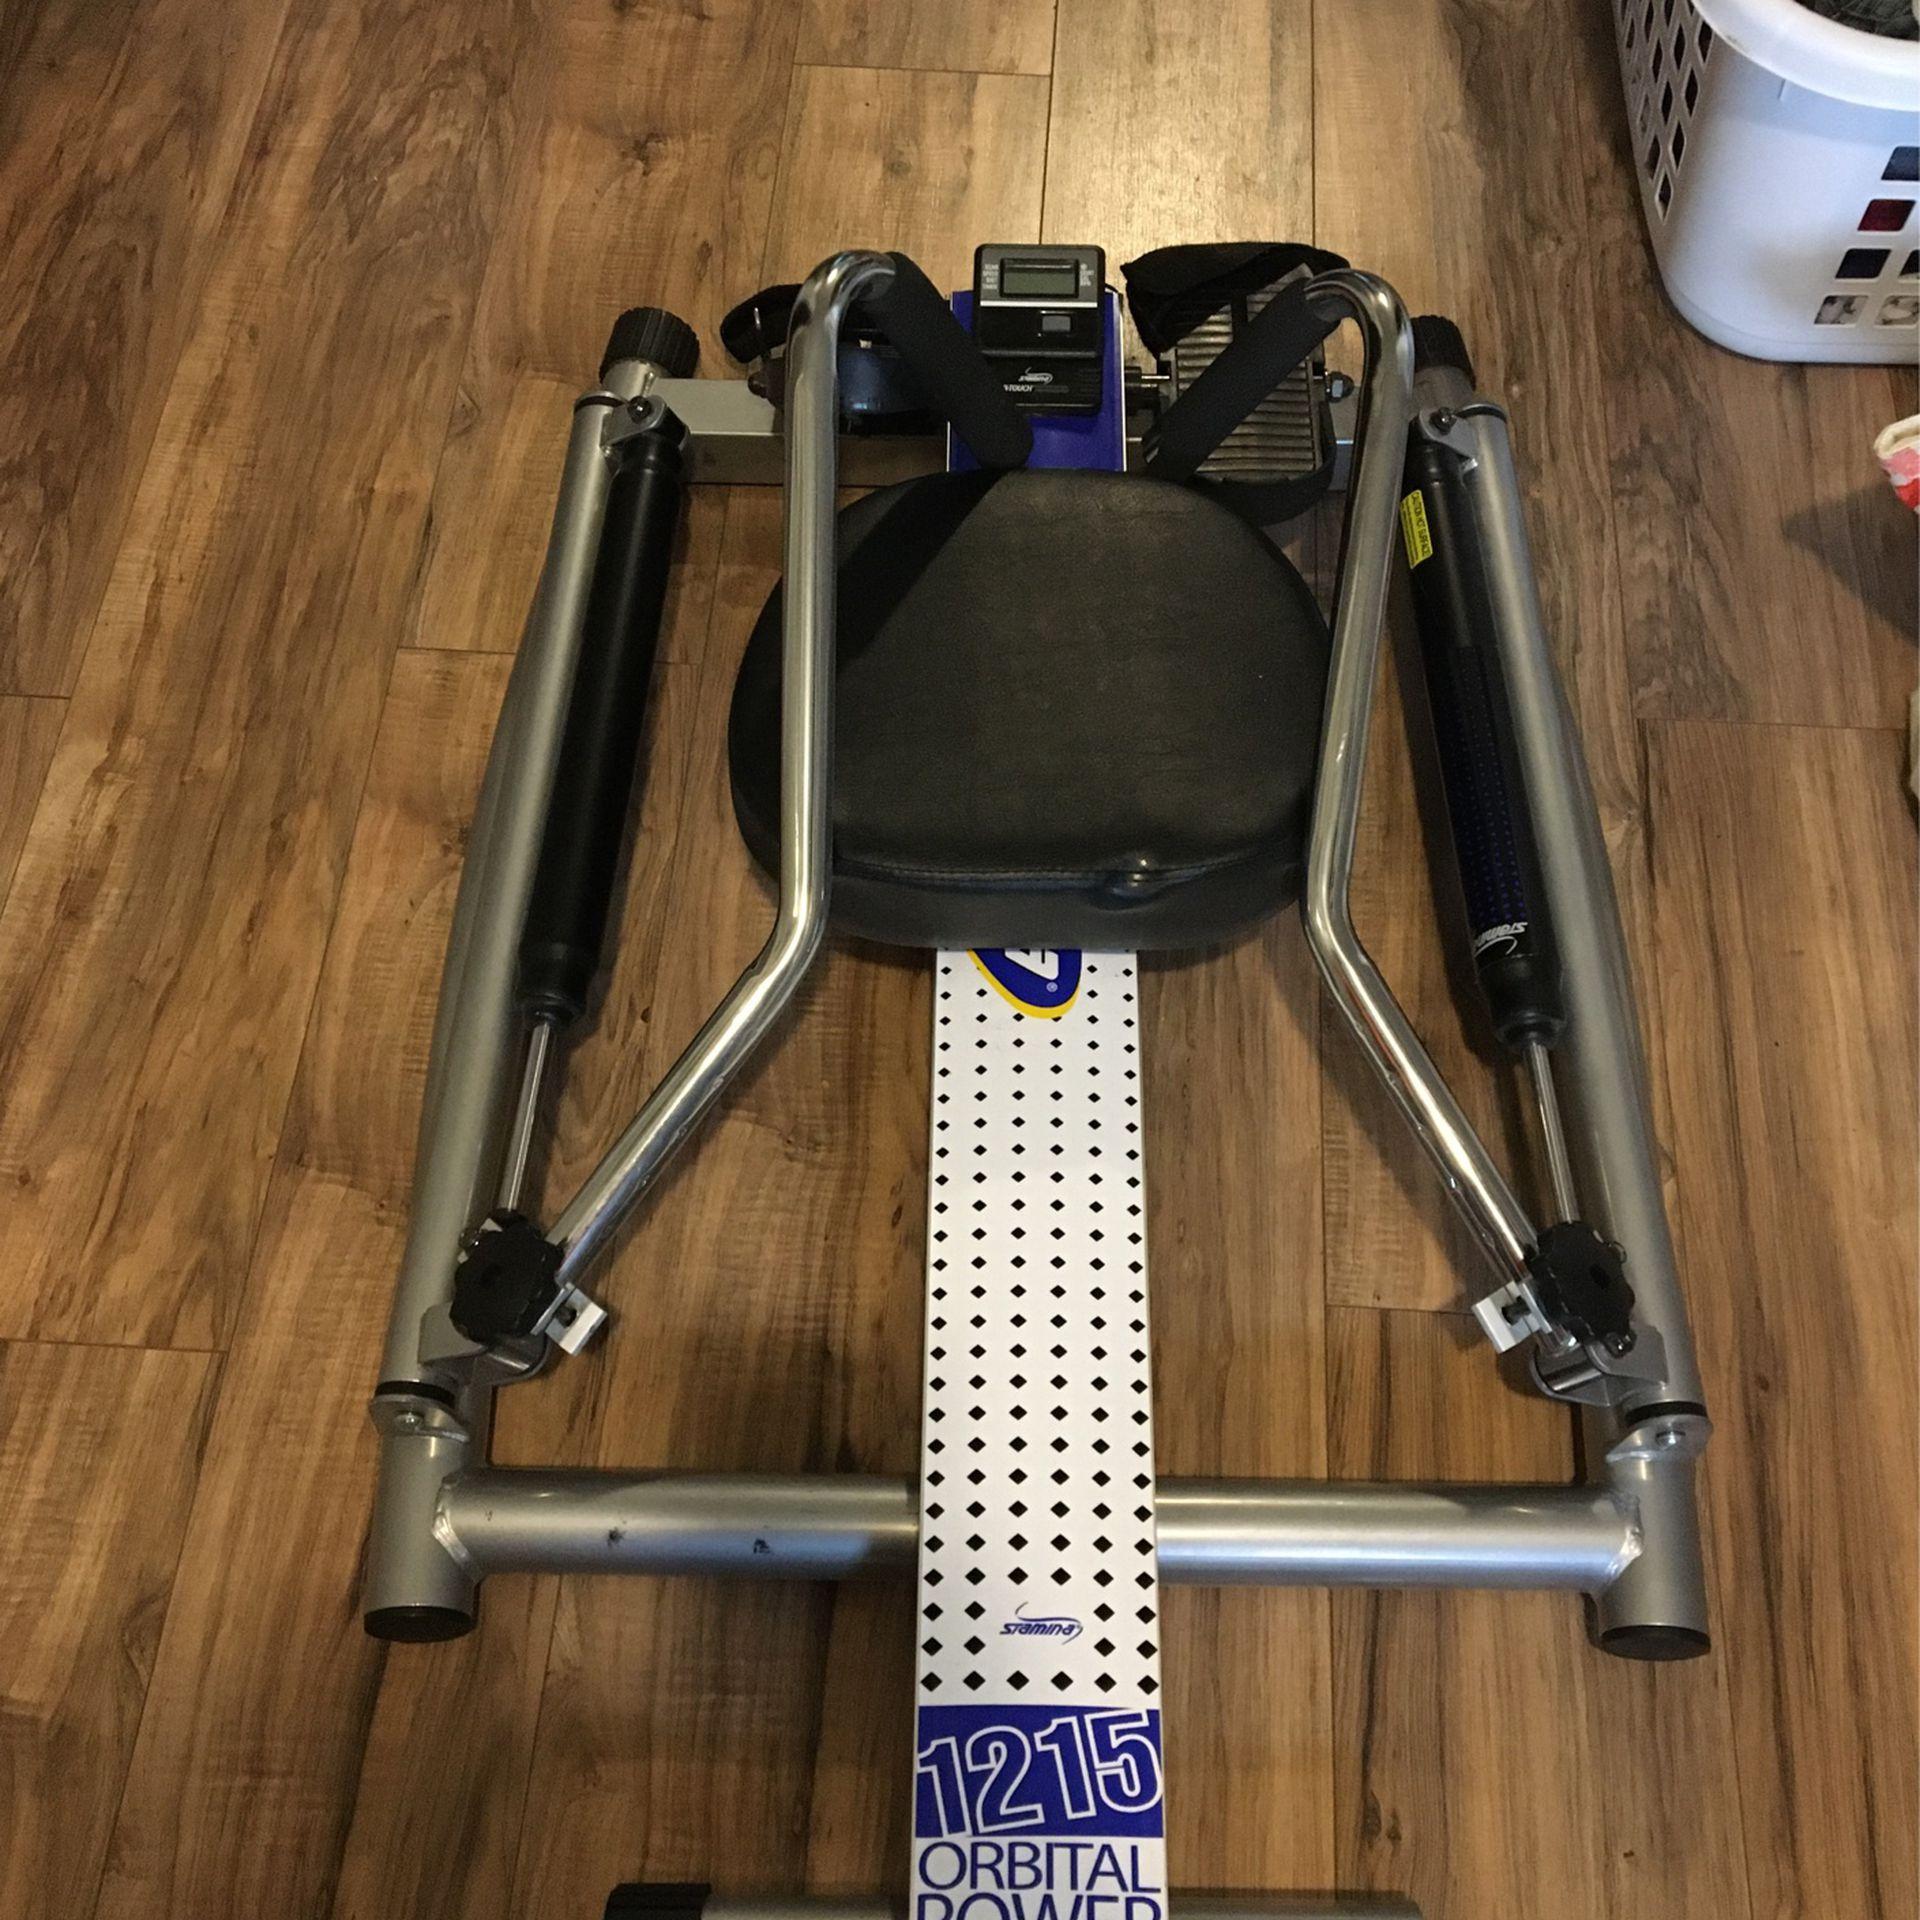 Stamina 1215 Orbital Rower